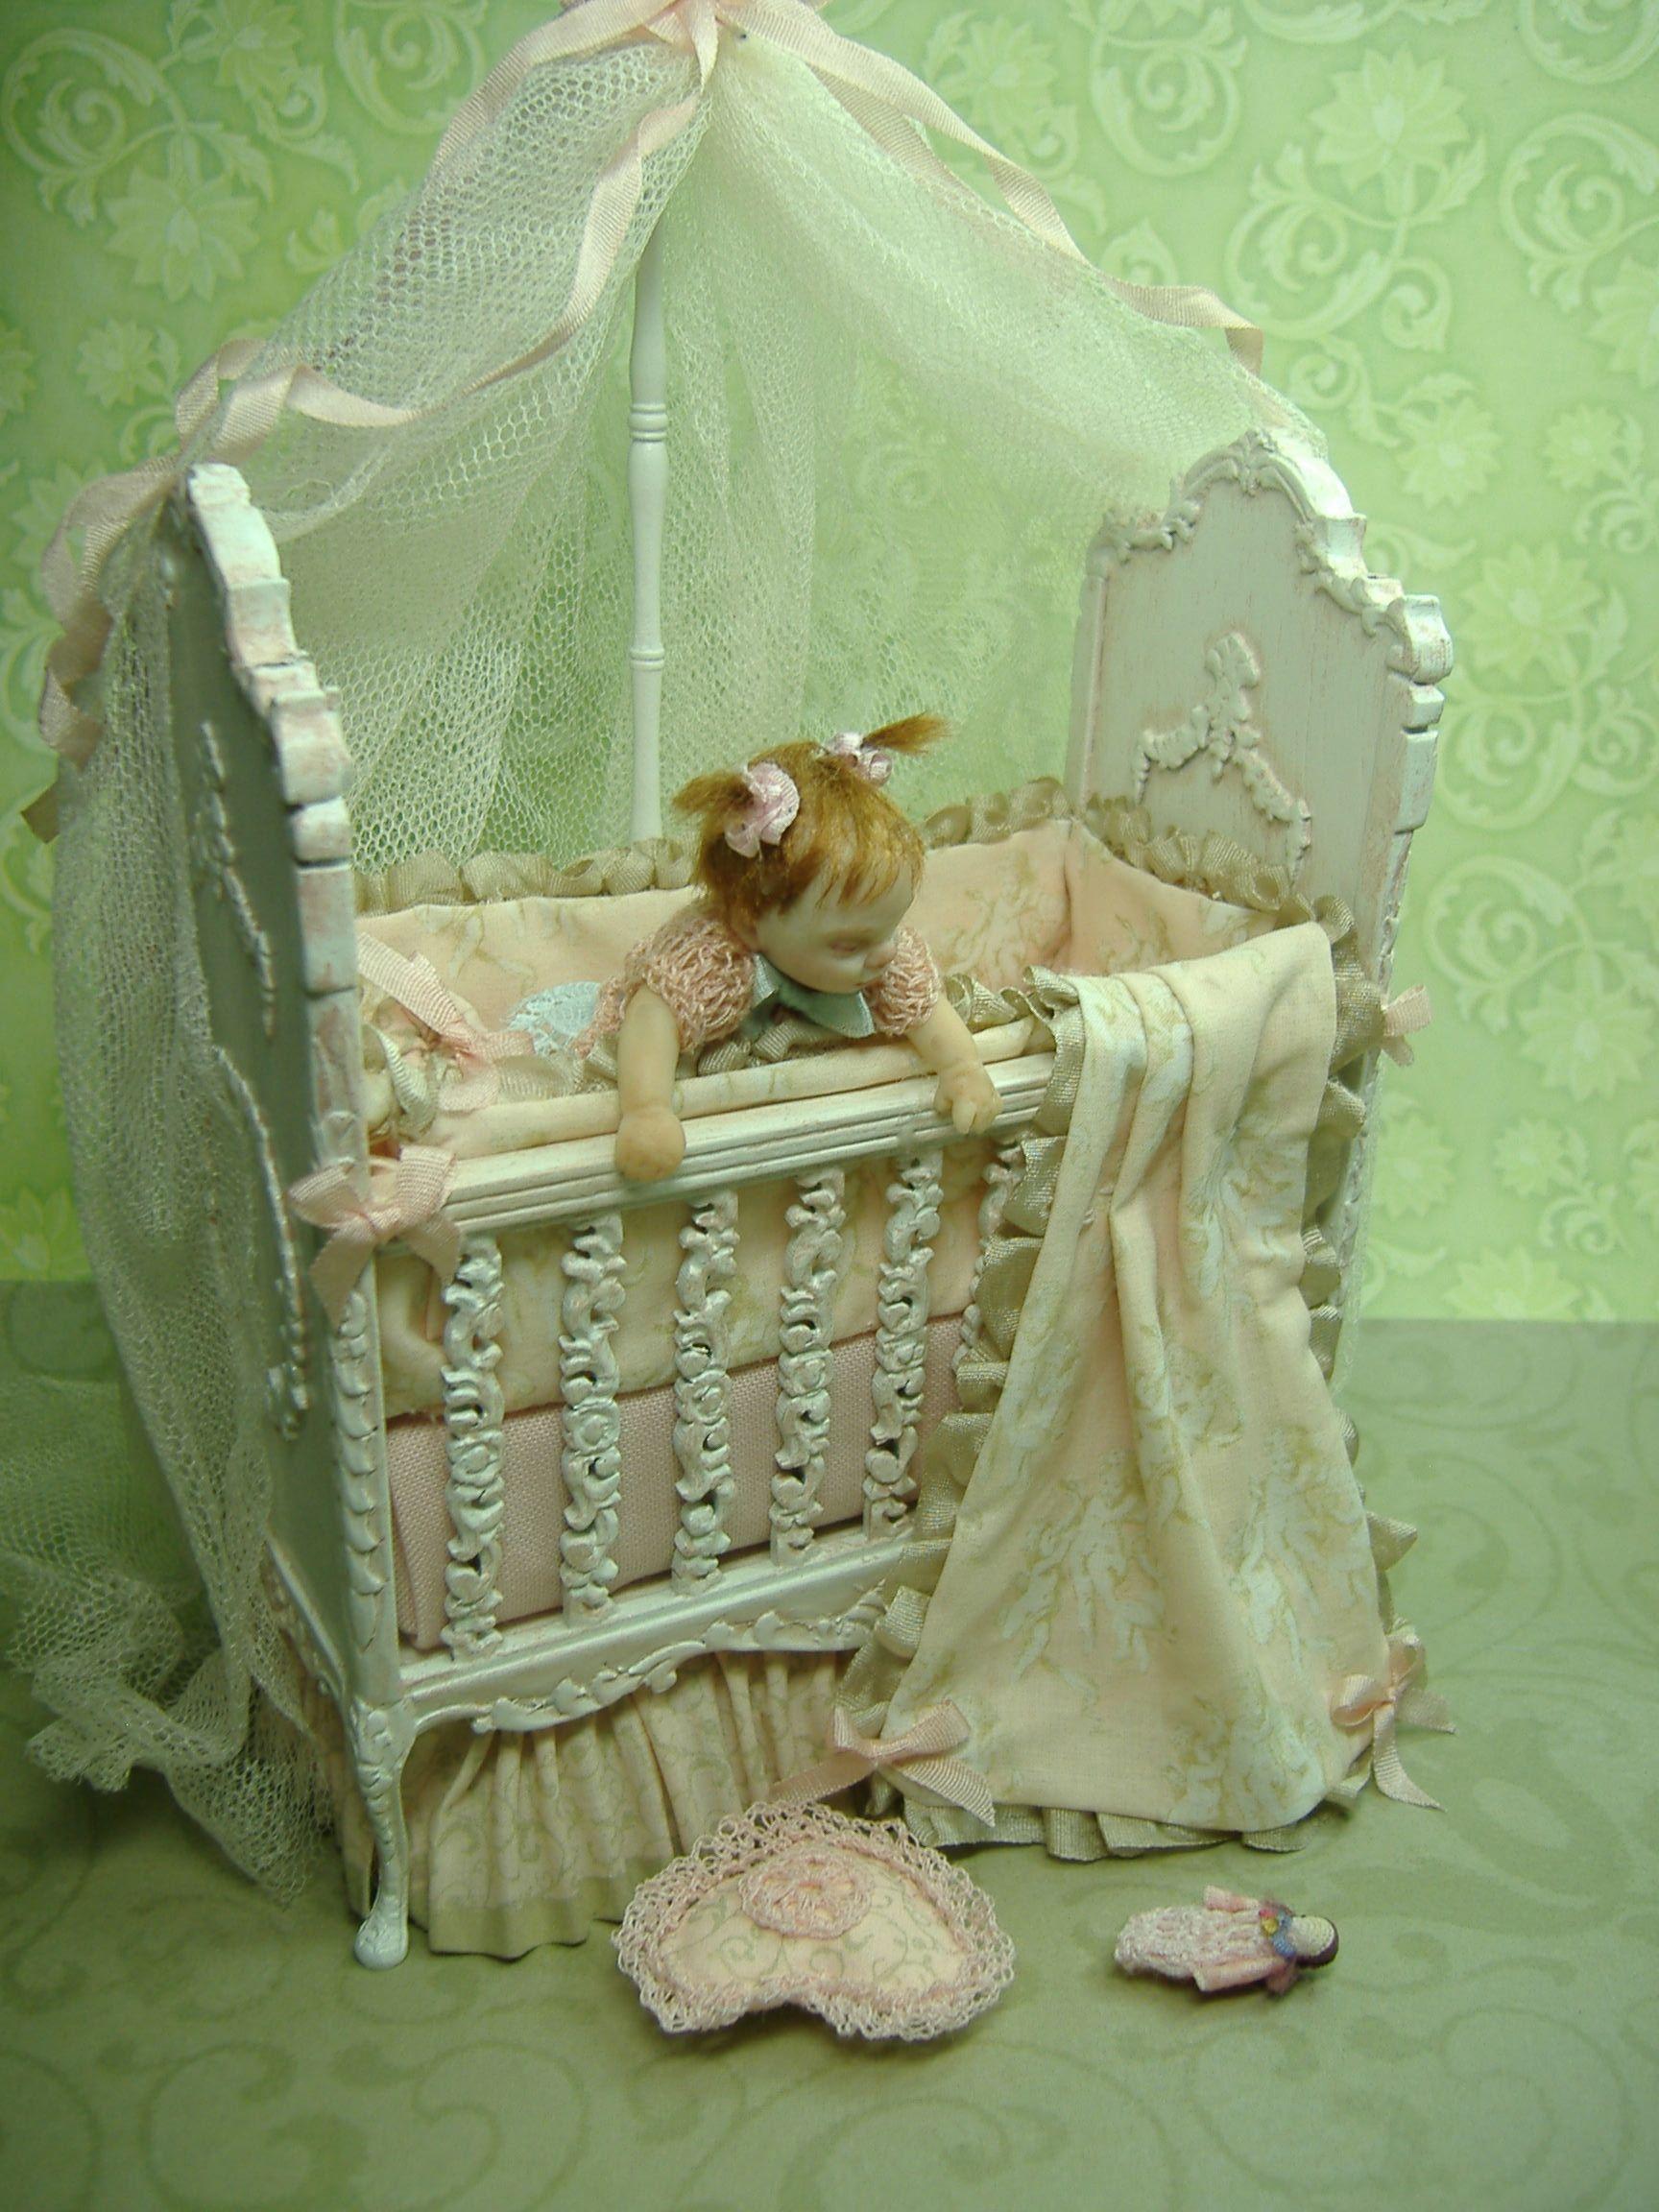 25 Miniature Soft Body Baby By Morena Ciambra  Dreamartdolls